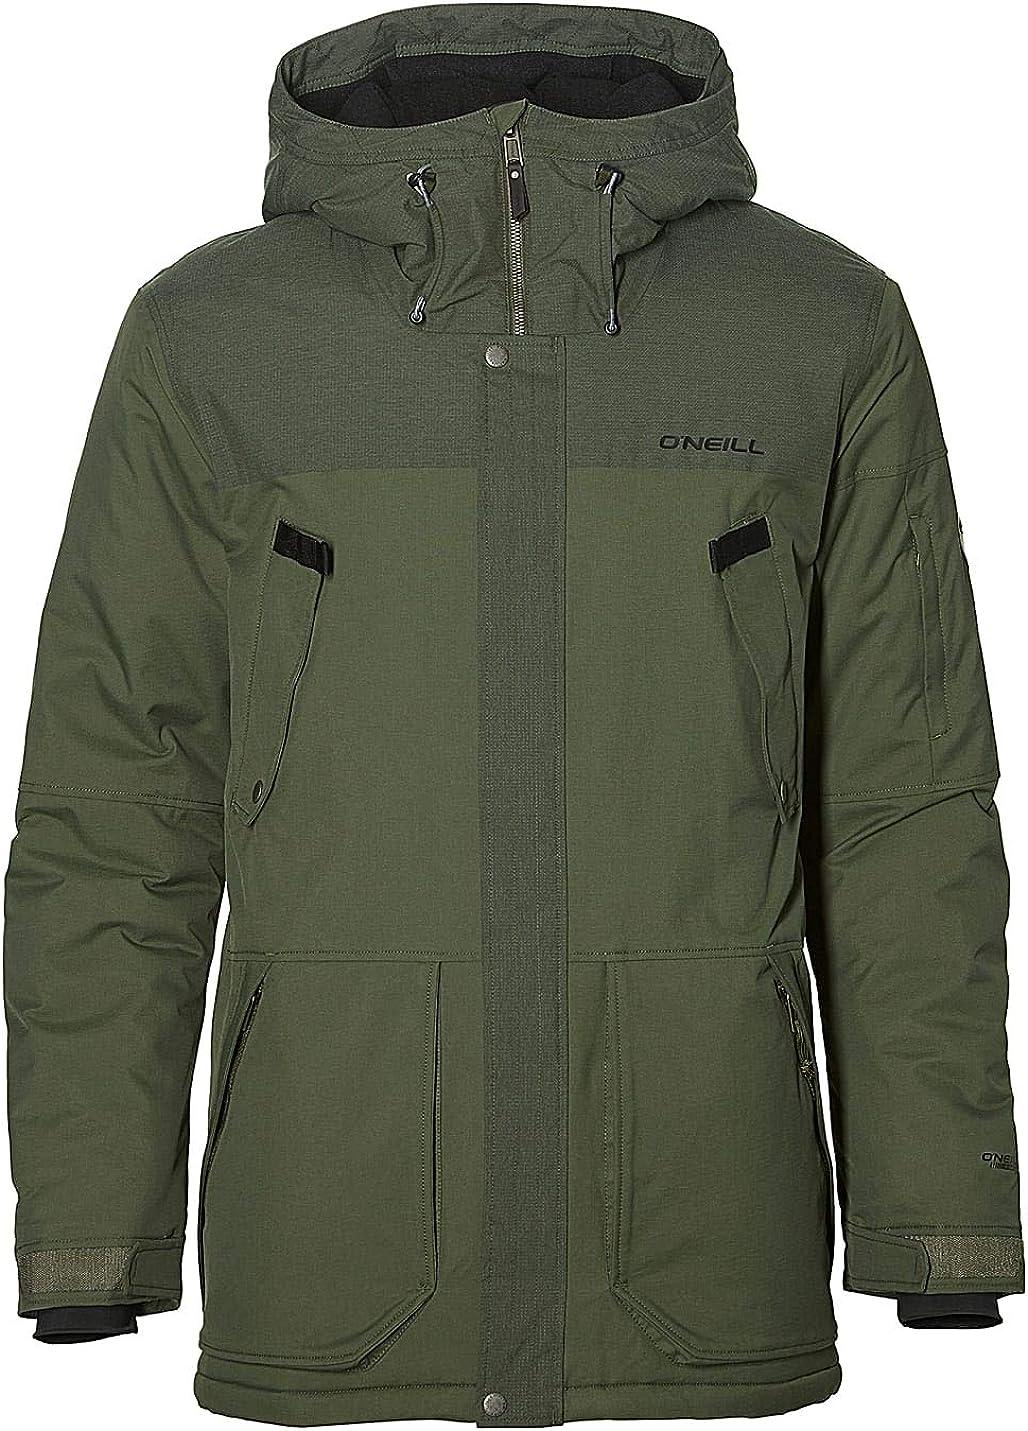 ONeill Herren Snowboard Jacke Hybrid Explorer Parka Jacket Jacken